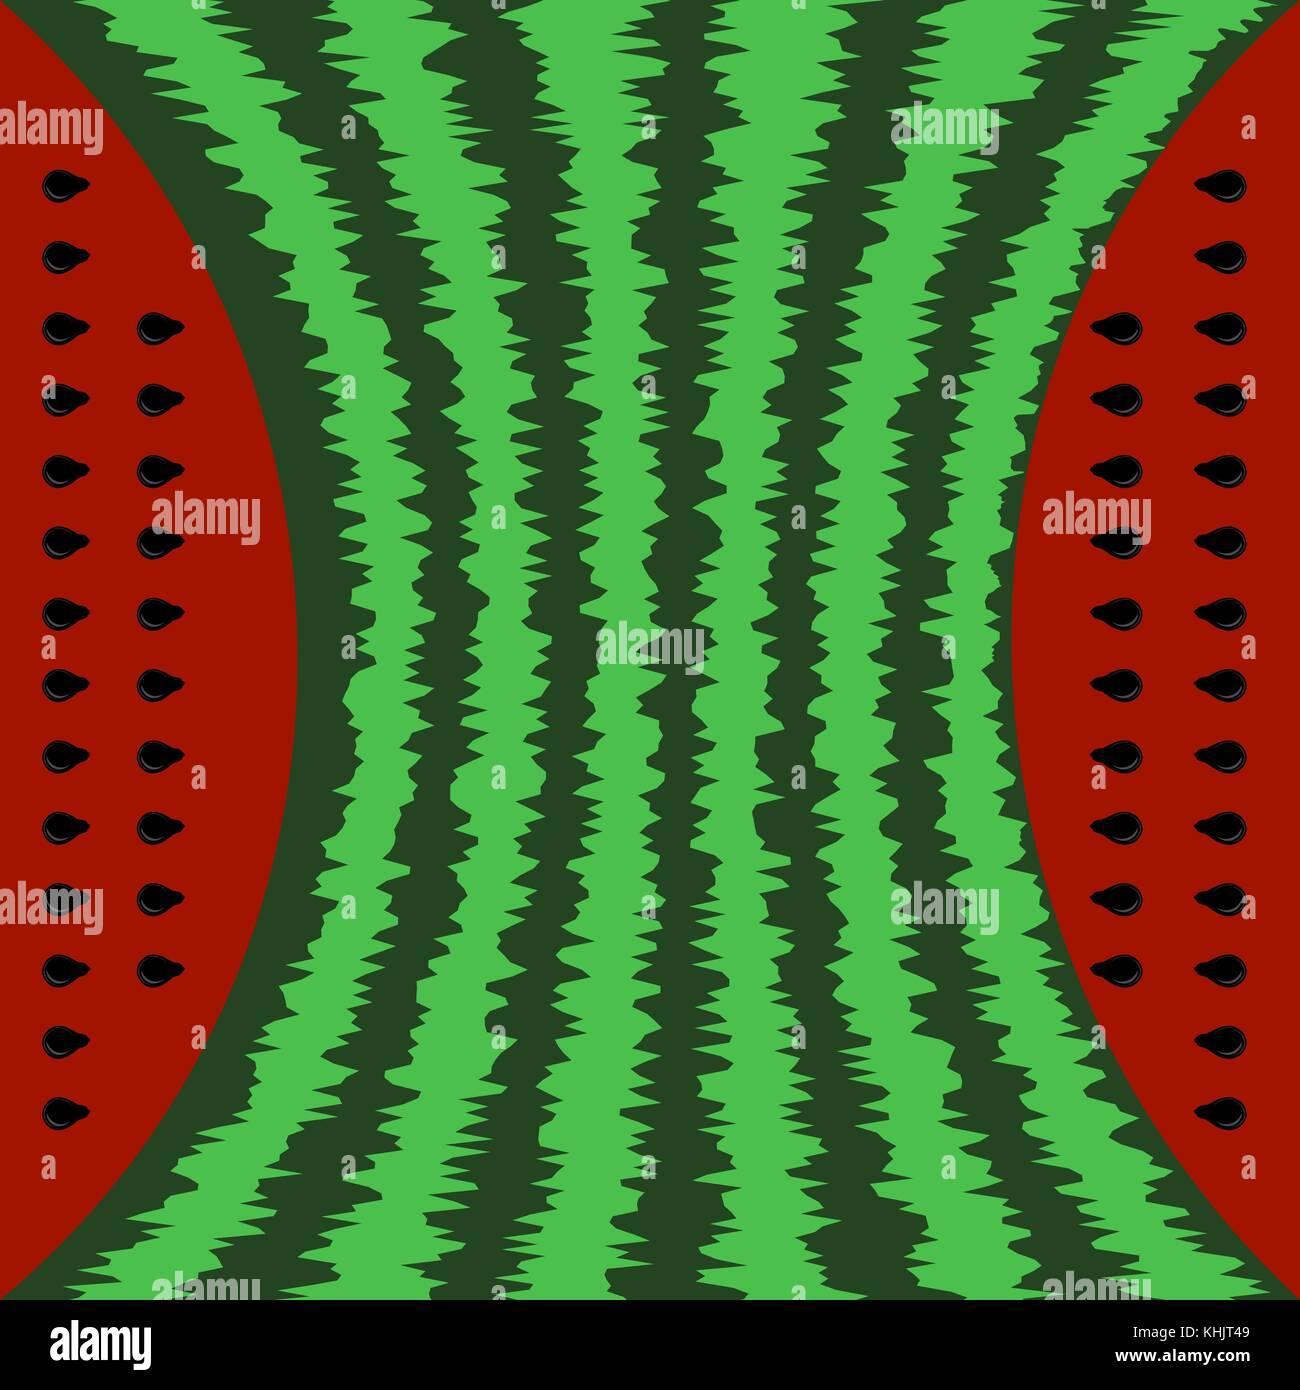 Fresh Slaced Ripe Watermelon on Seeds Background - Stock Image